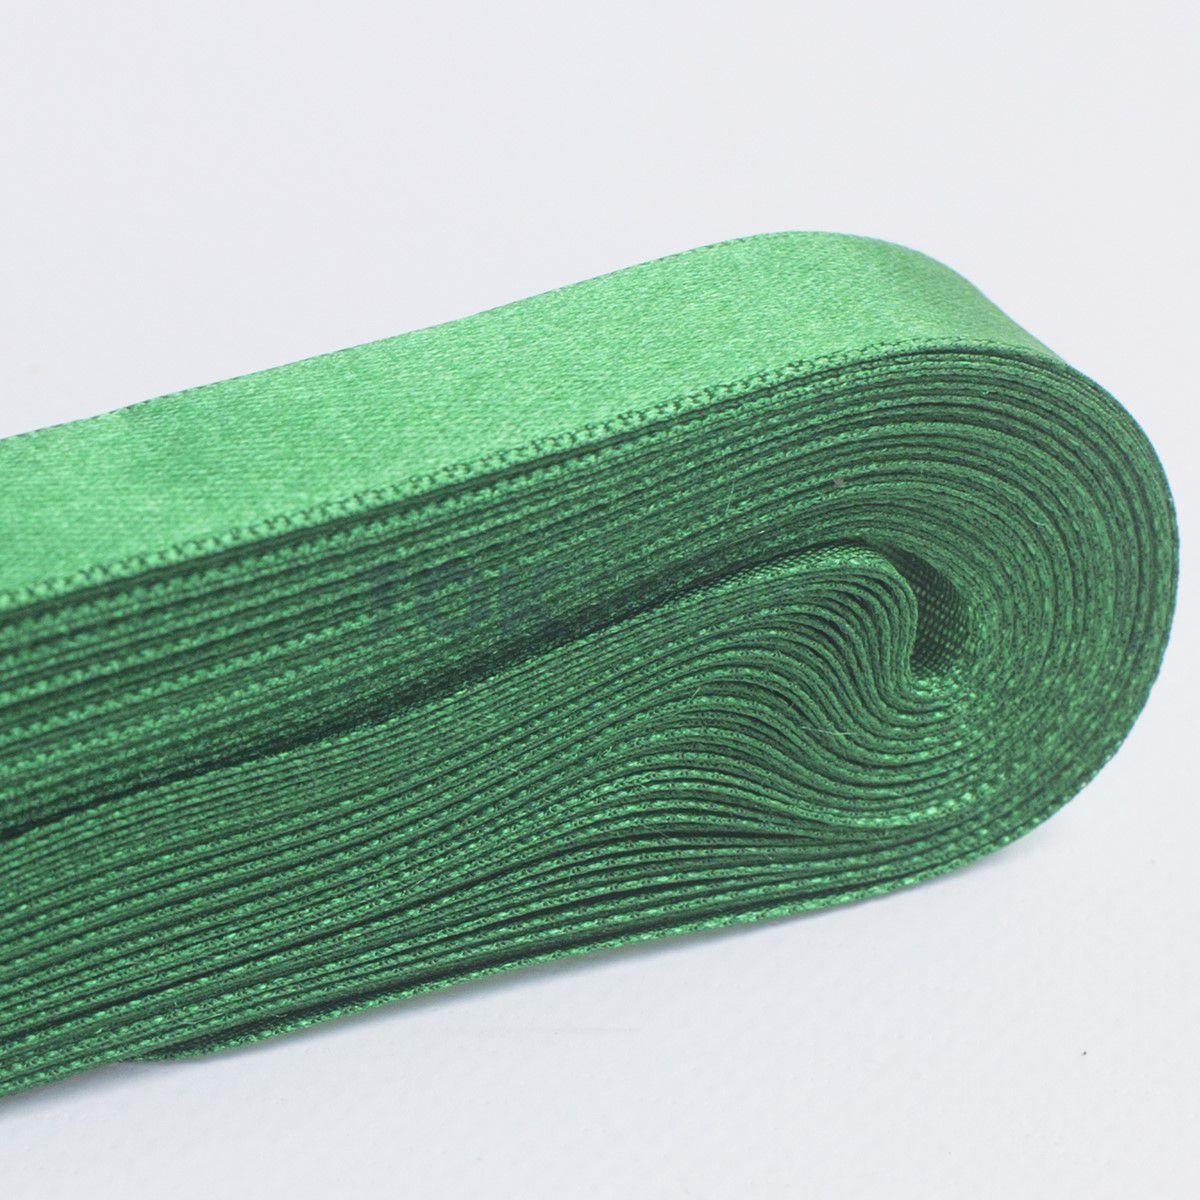 Fita Cetim N.1 - 7mm - 10 Metros - COR (23) Verde Bandeira